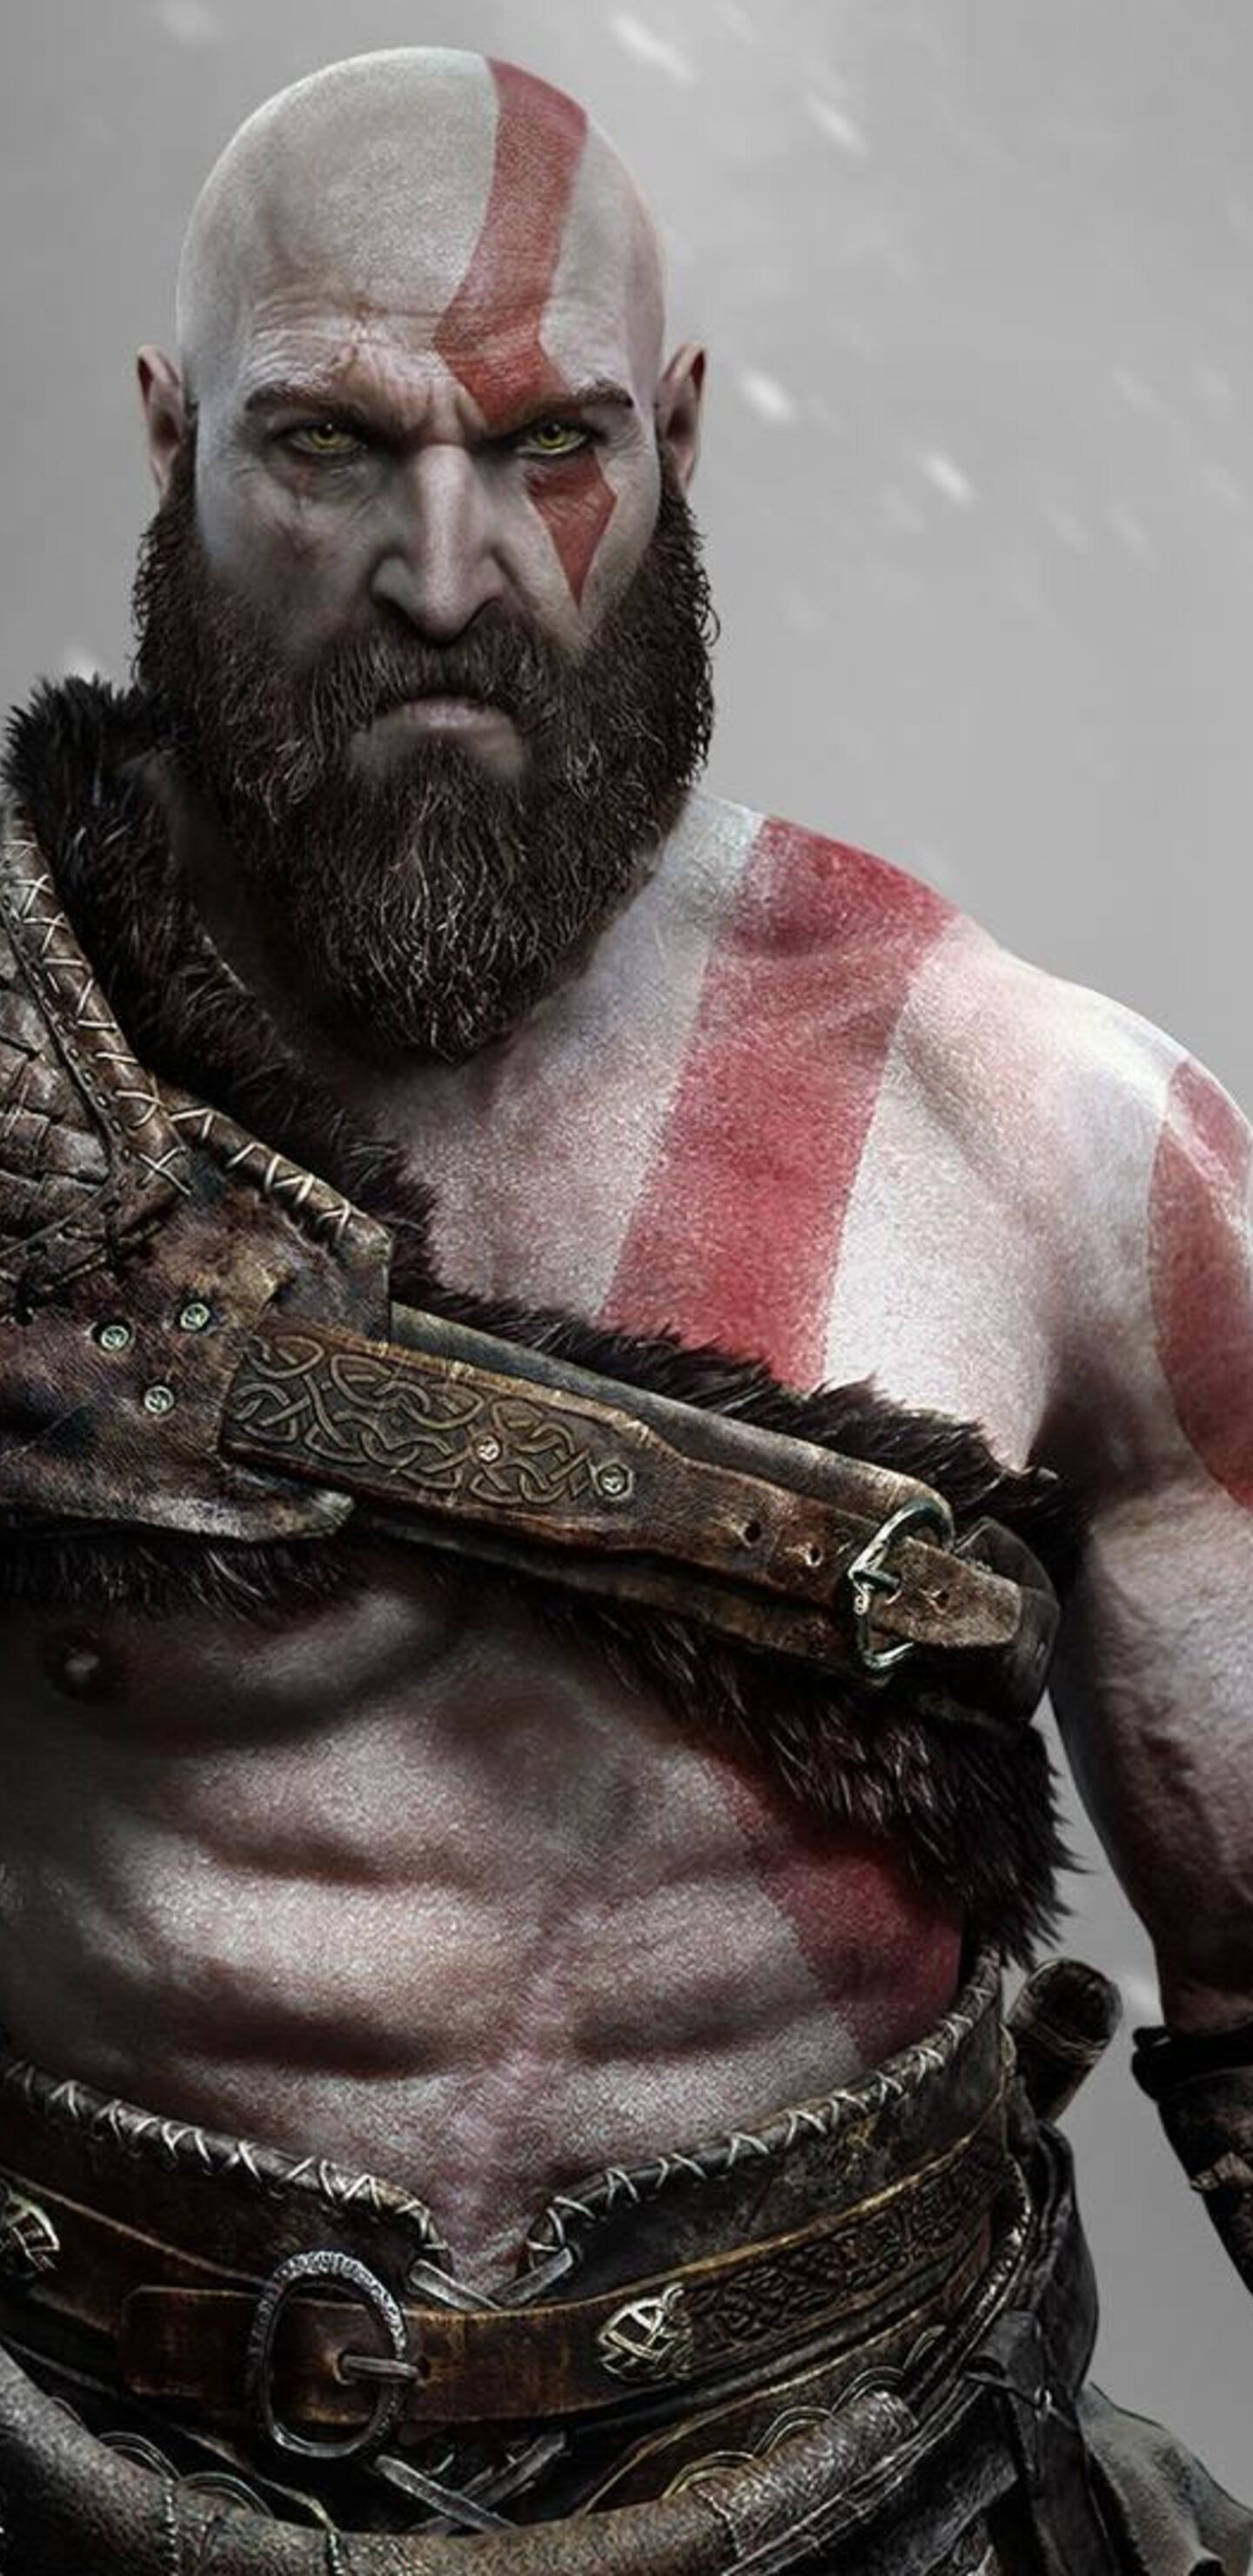 1440x2960 Kratos God Of War Samsung Galaxy Note 9 8 S9 S8 S8 Qhd